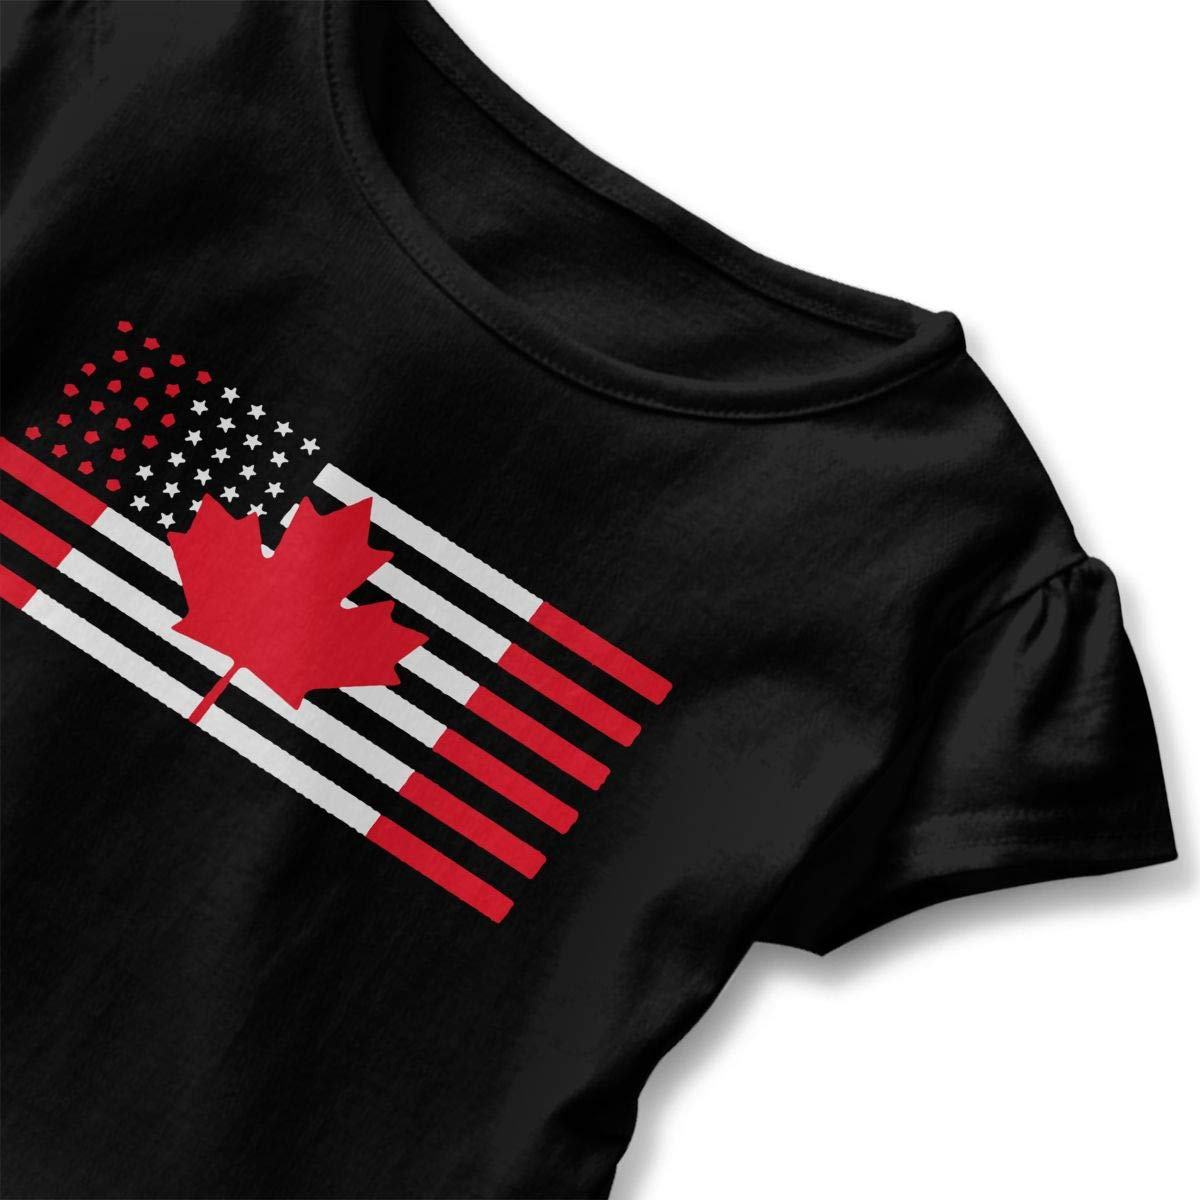 SHIRT1-KIDS USA Canada Flag Toddler//Infant Girls Short Sleeve T-Shirts Ruffles Shirt T-Shirt for 2-6T